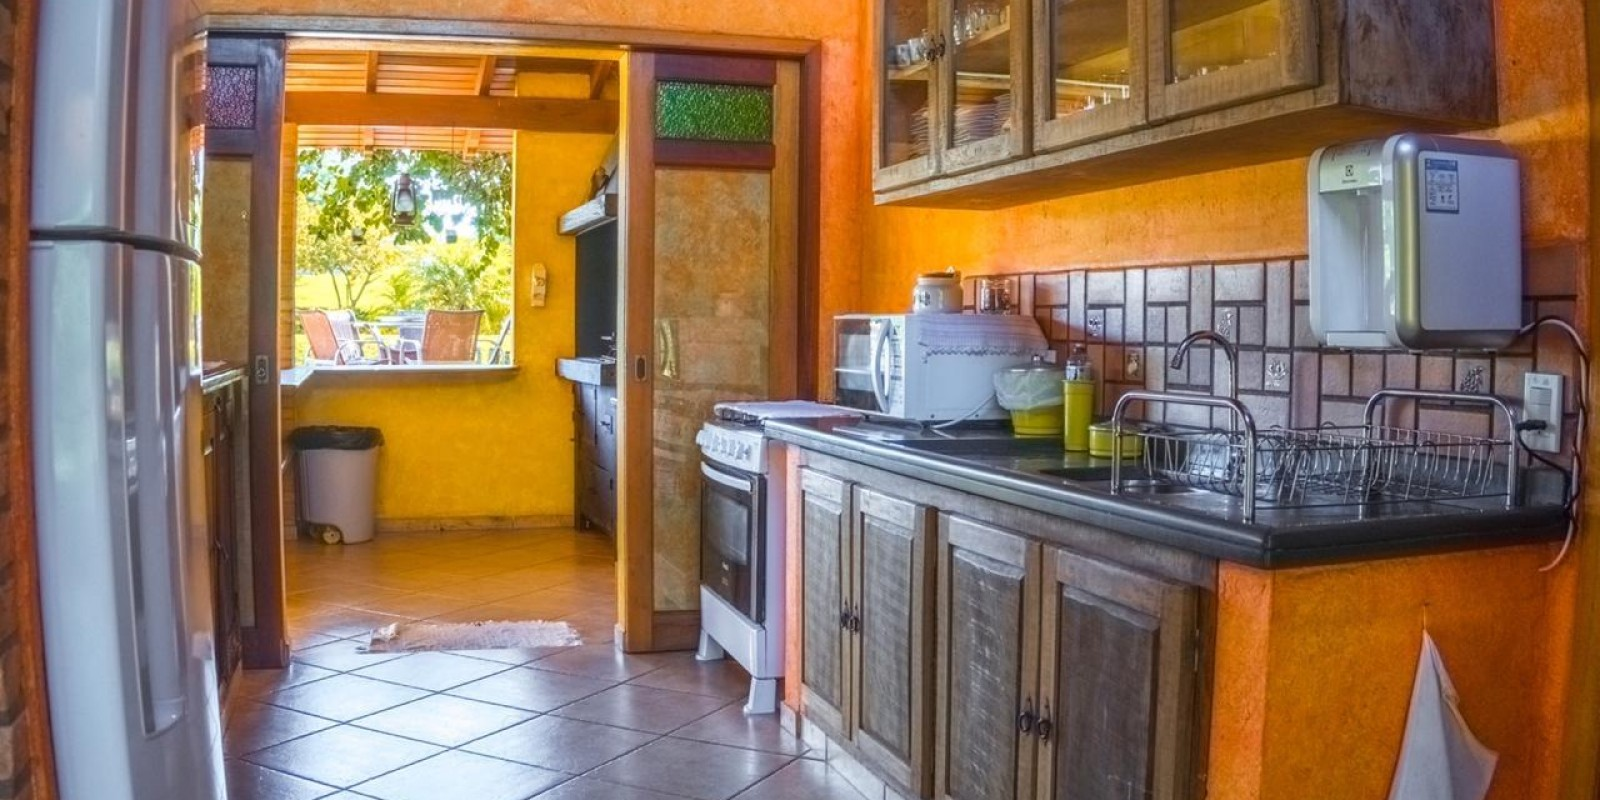 Casa na Represa no Condomínio Riviera Sta Cristina XIII  - Foto 6 de 39